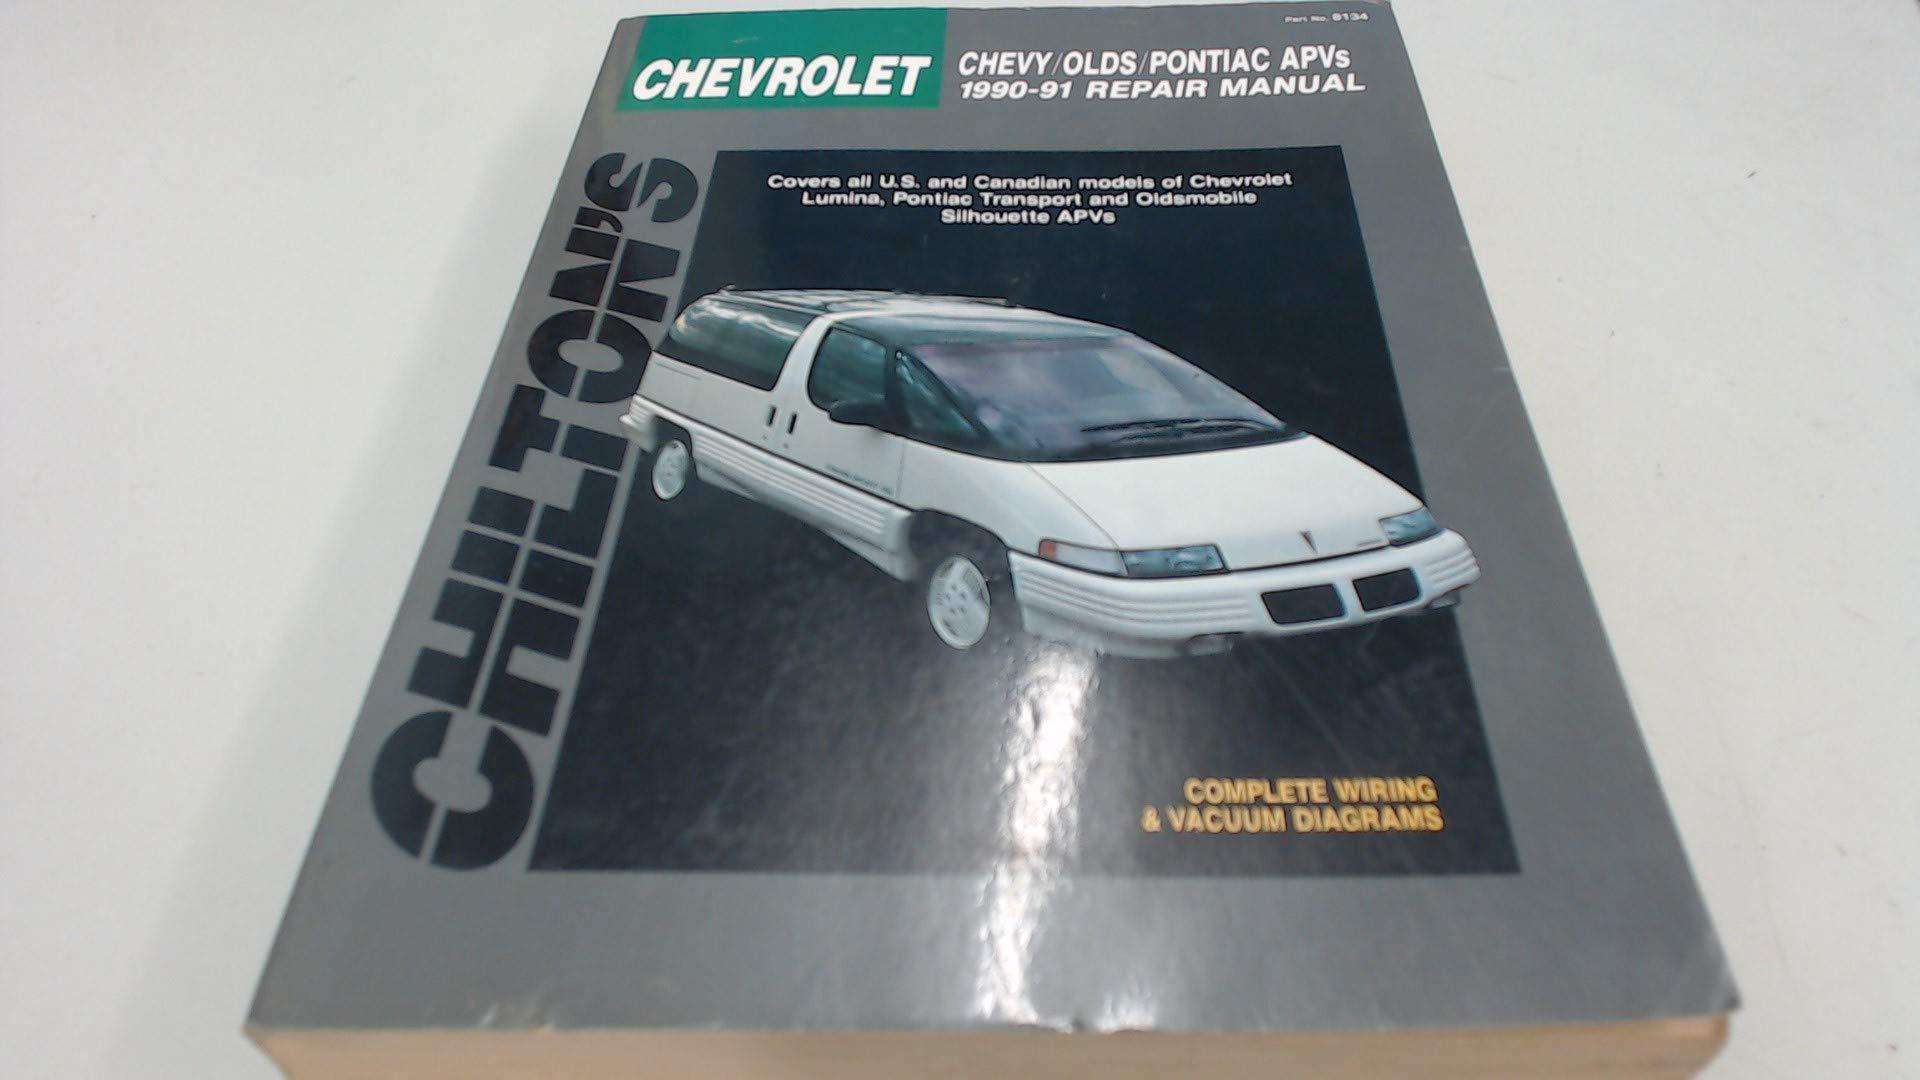 Chevrolet Lumina Pontiac Transport Olds Silhouette 1990 91 Repair Laguna Replacement Parts Motor Repalcement And Diagram Manual Total Car Care Chilton Automotive Books 9780801981340